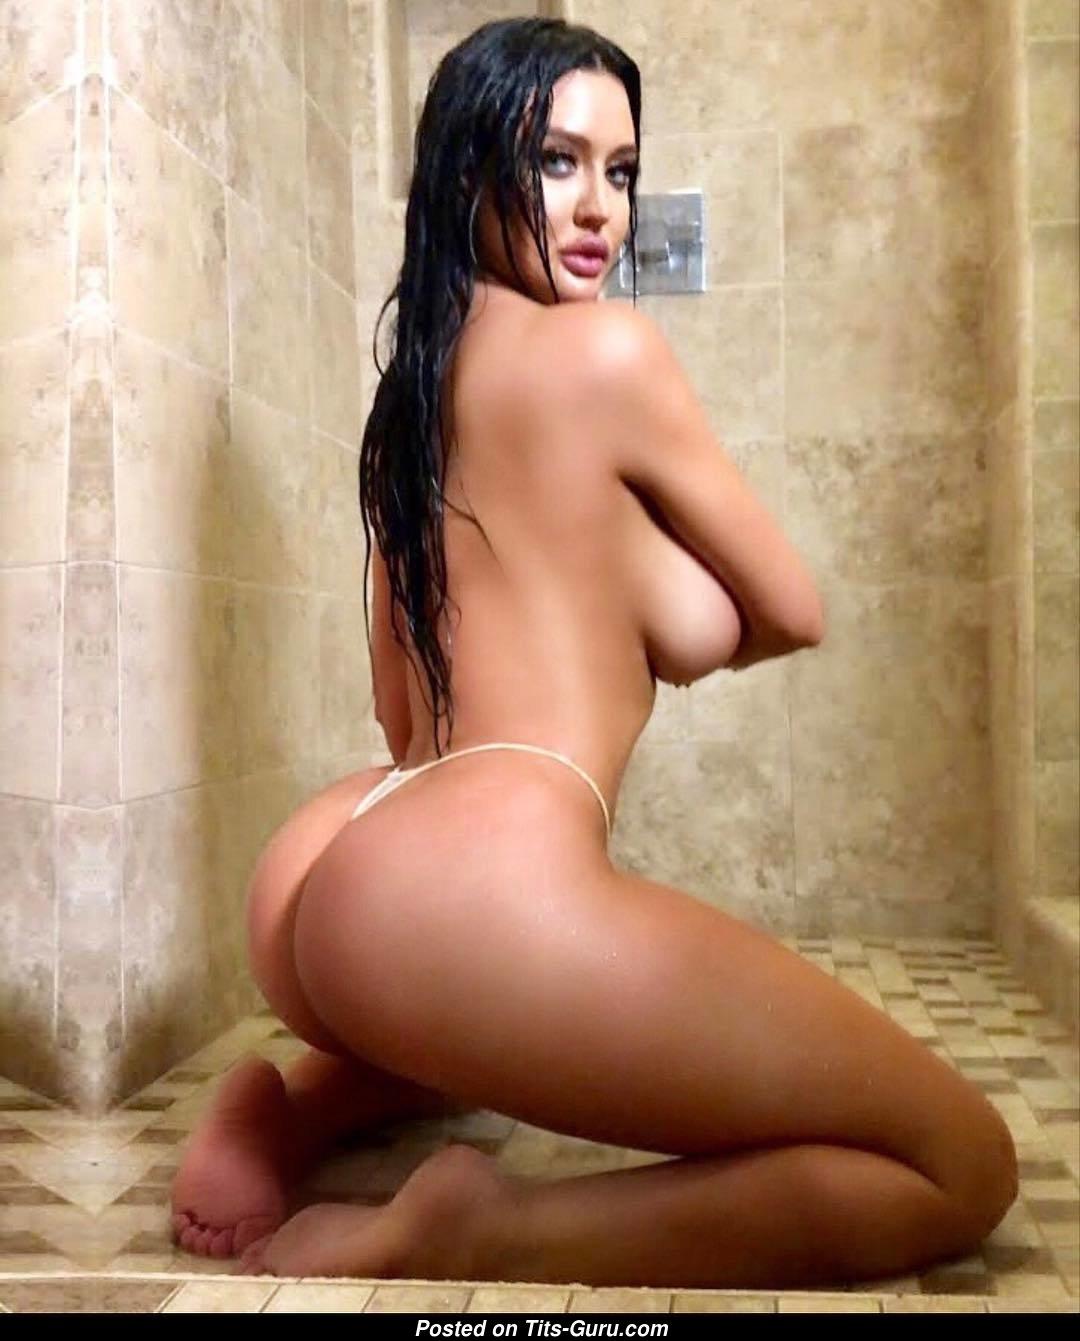 Becky nichols naked